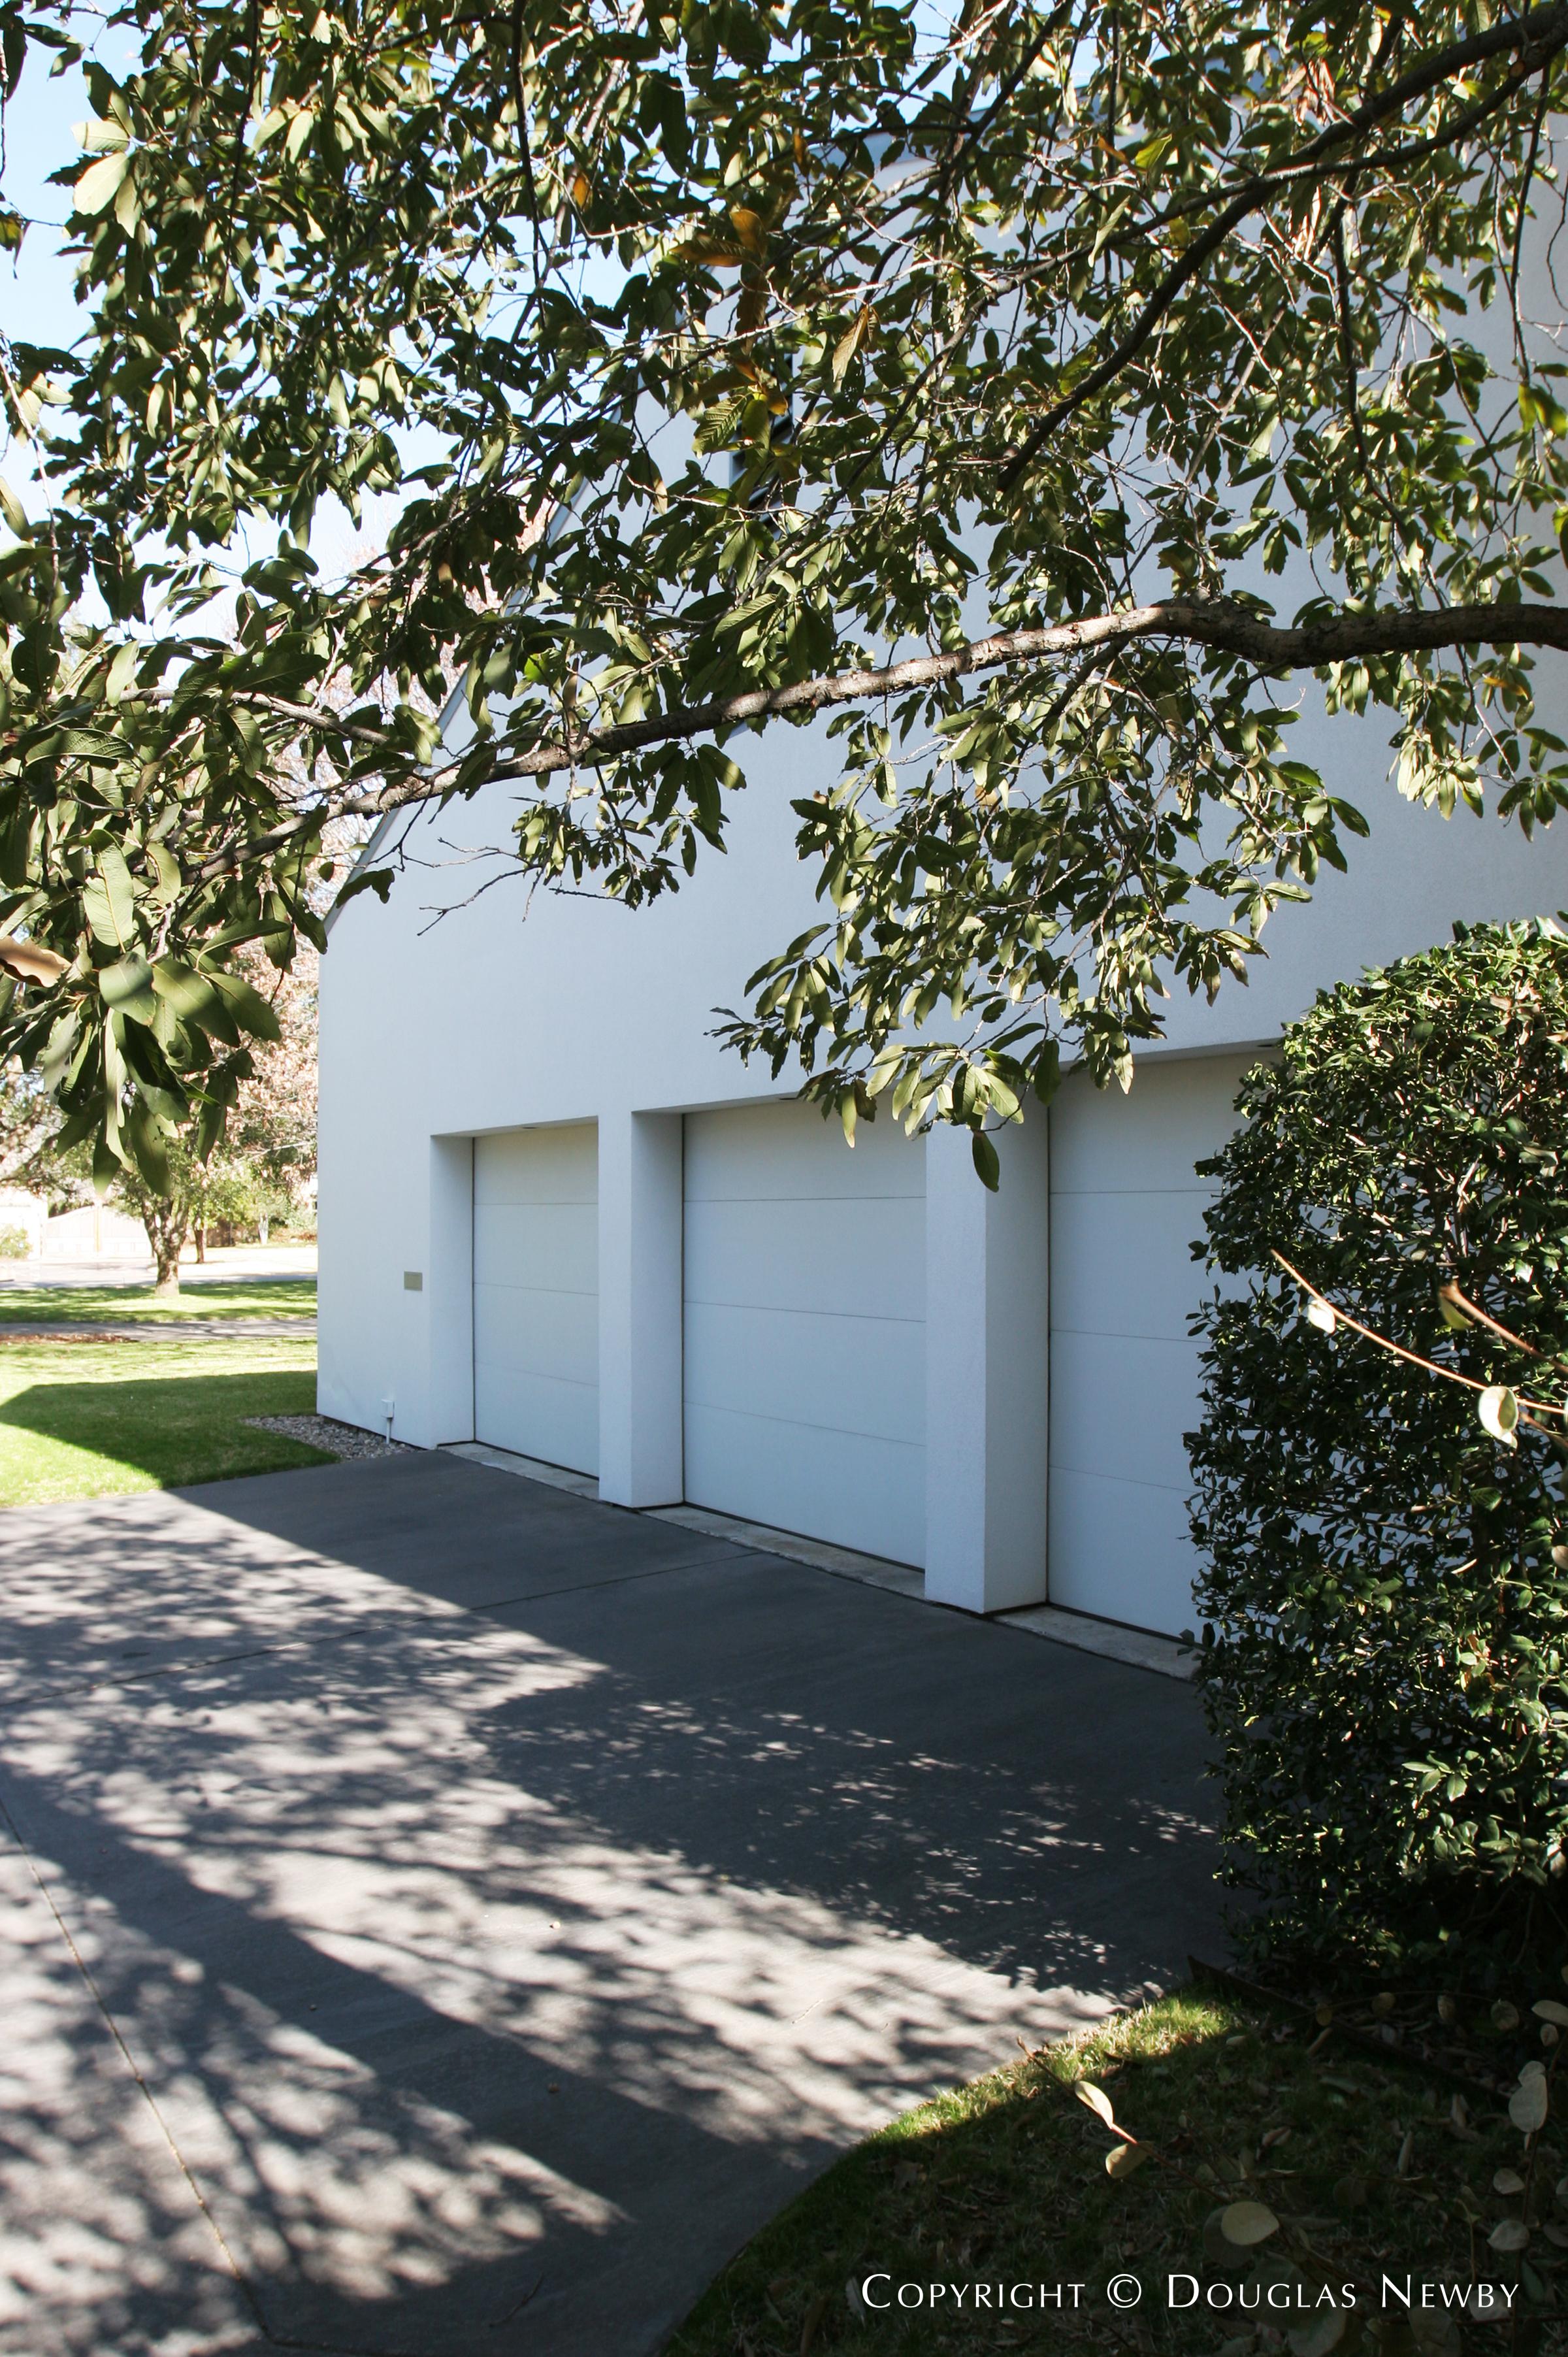 Preston Hollow Modern Home sitting on 0.7 Acres